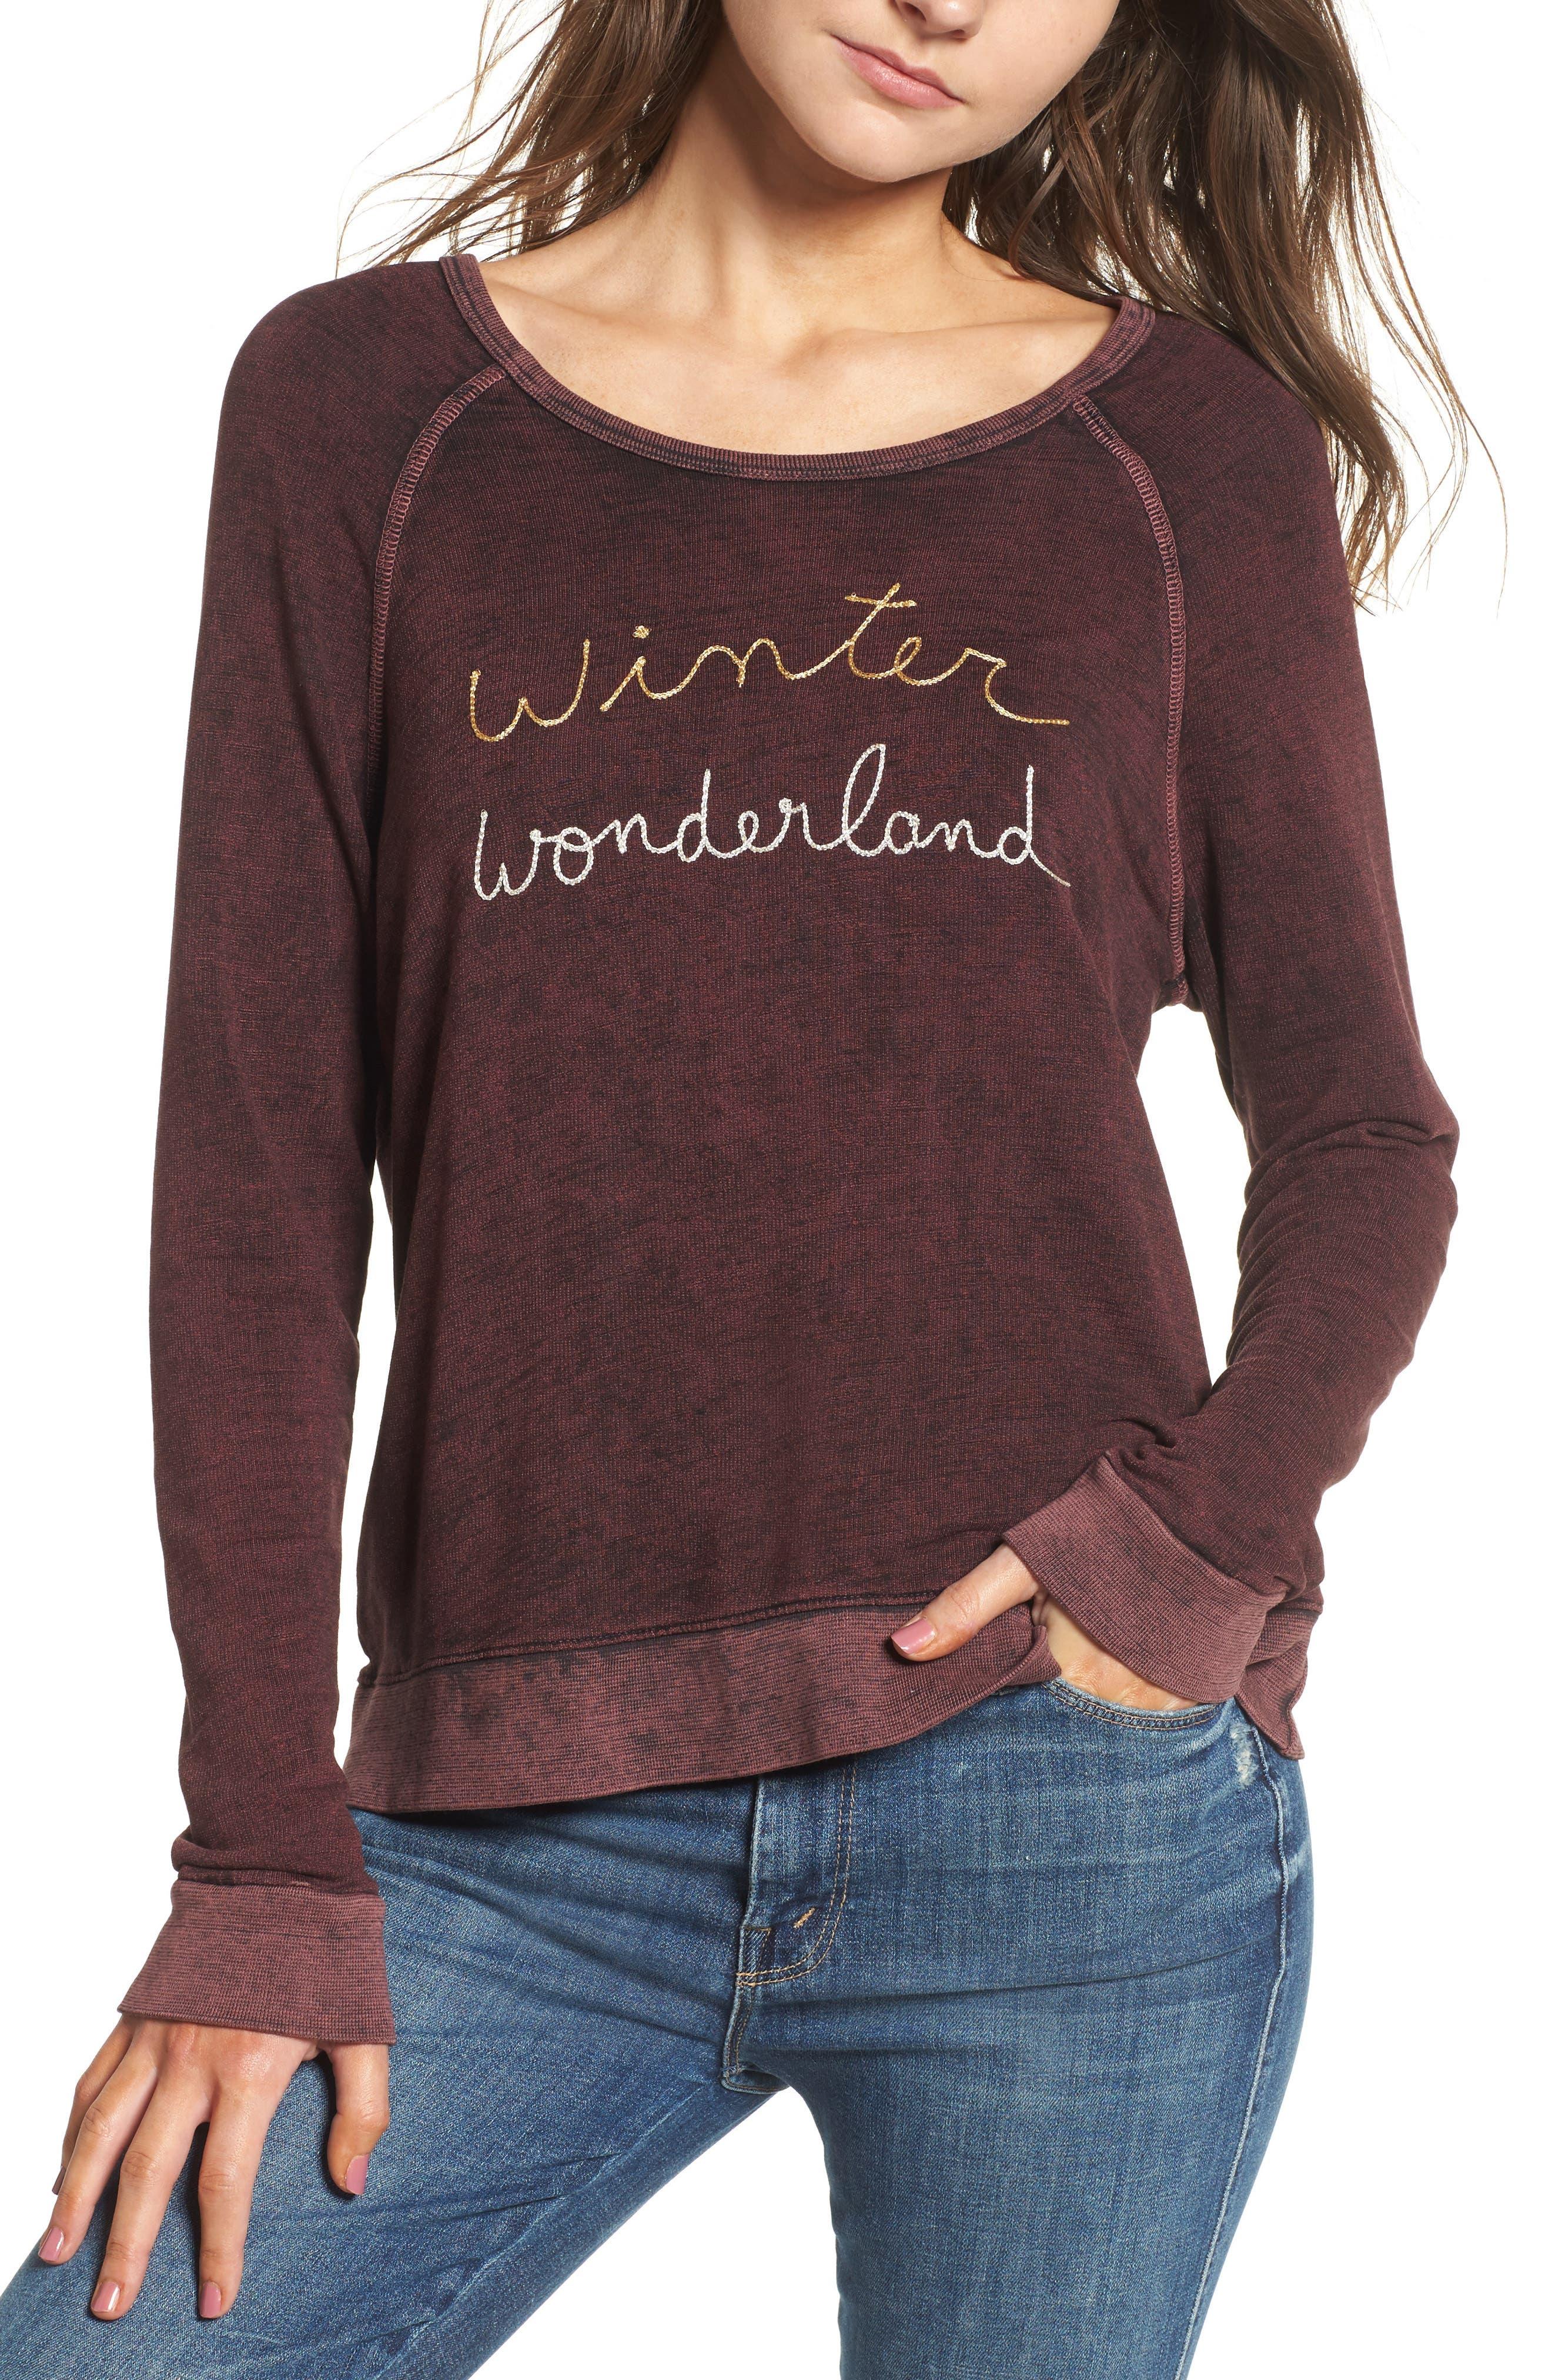 Active Winter Wonderland Sweatshirt,                             Main thumbnail 1, color,                             Burgundy Acid Wash